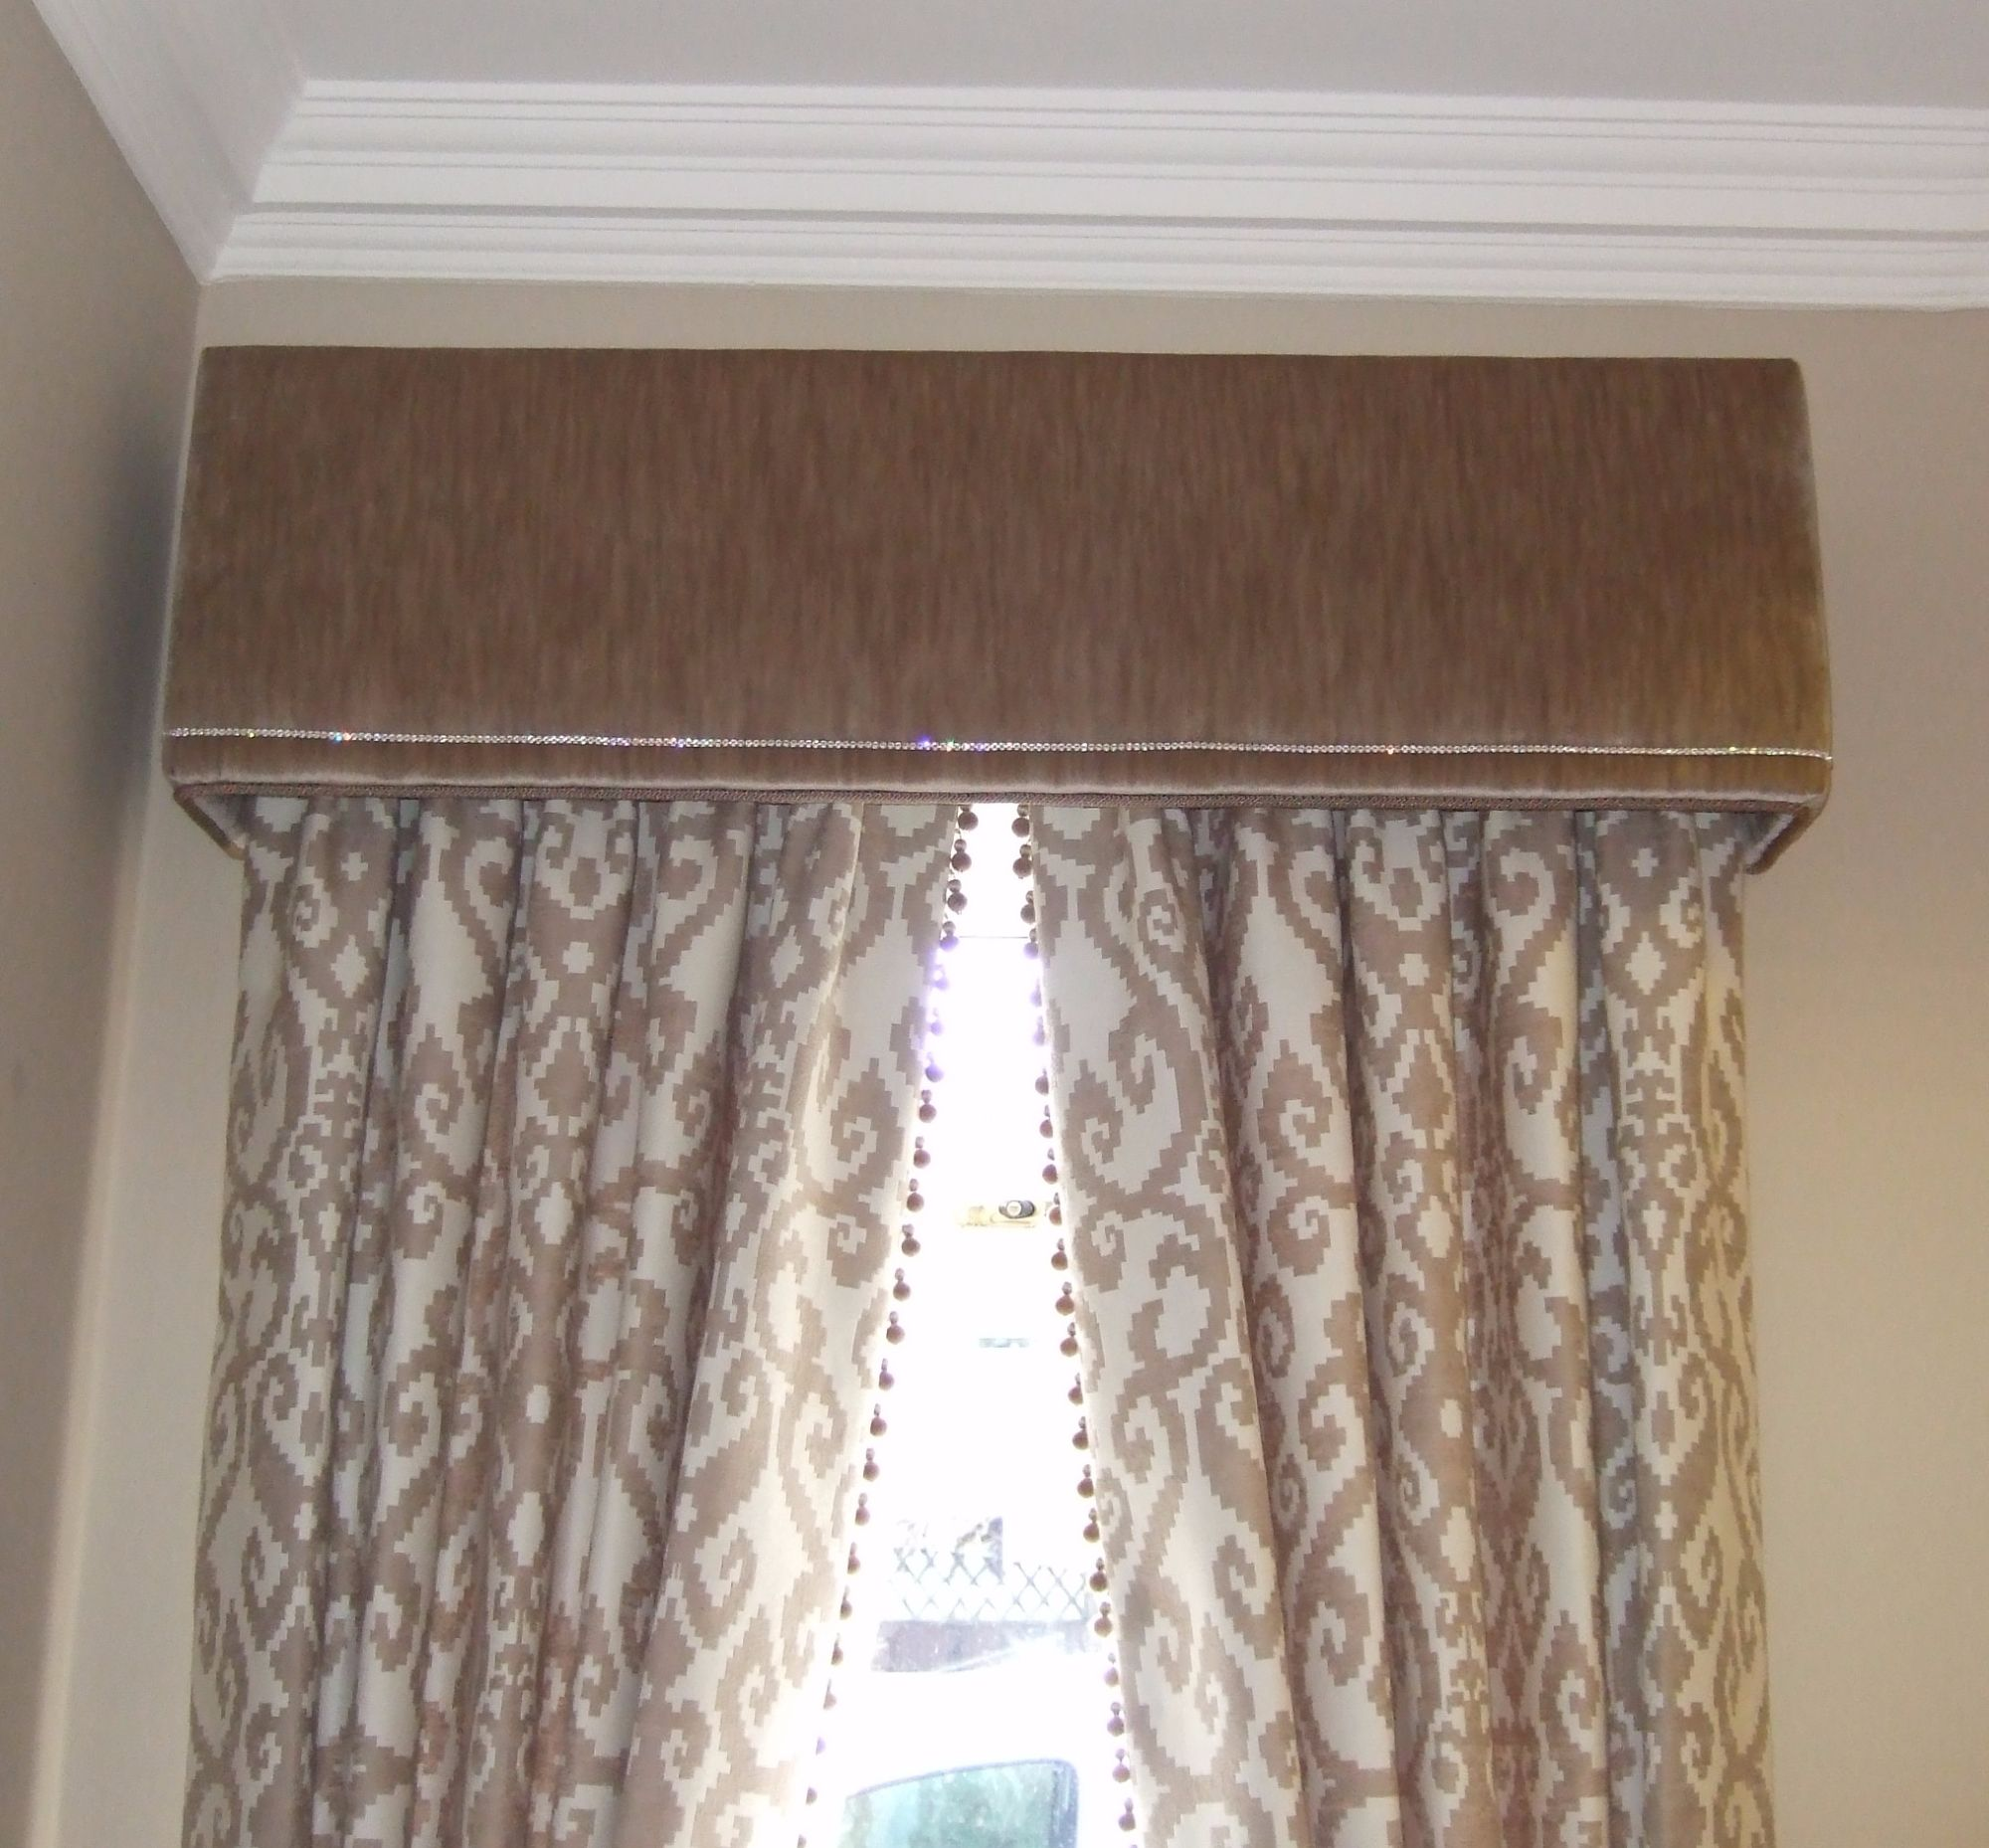 Bobble trim curtains crystal pelmet